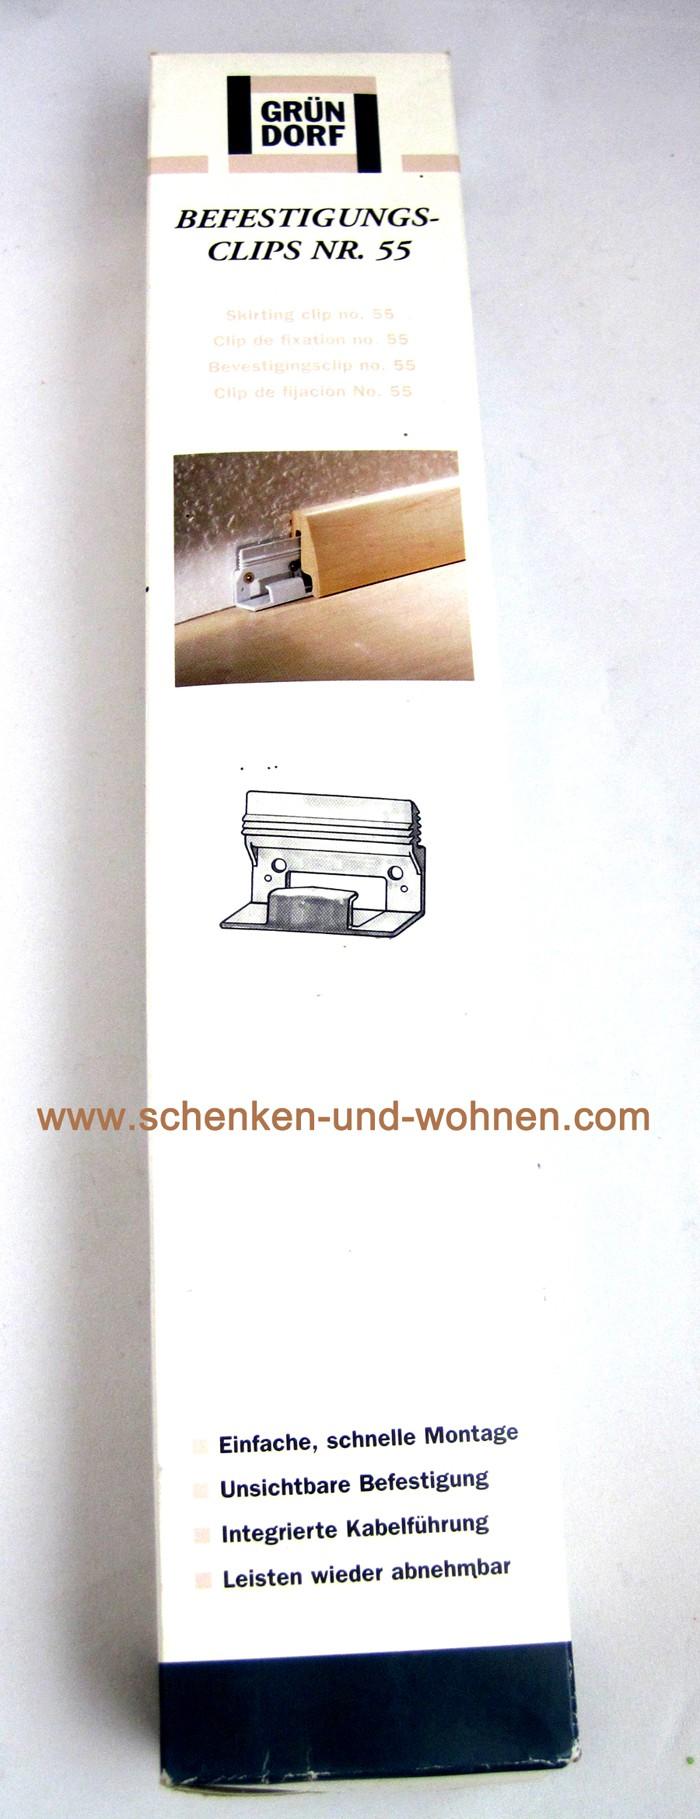 Befestigungsclips Nr. 55 30 Stück Sockelleiste